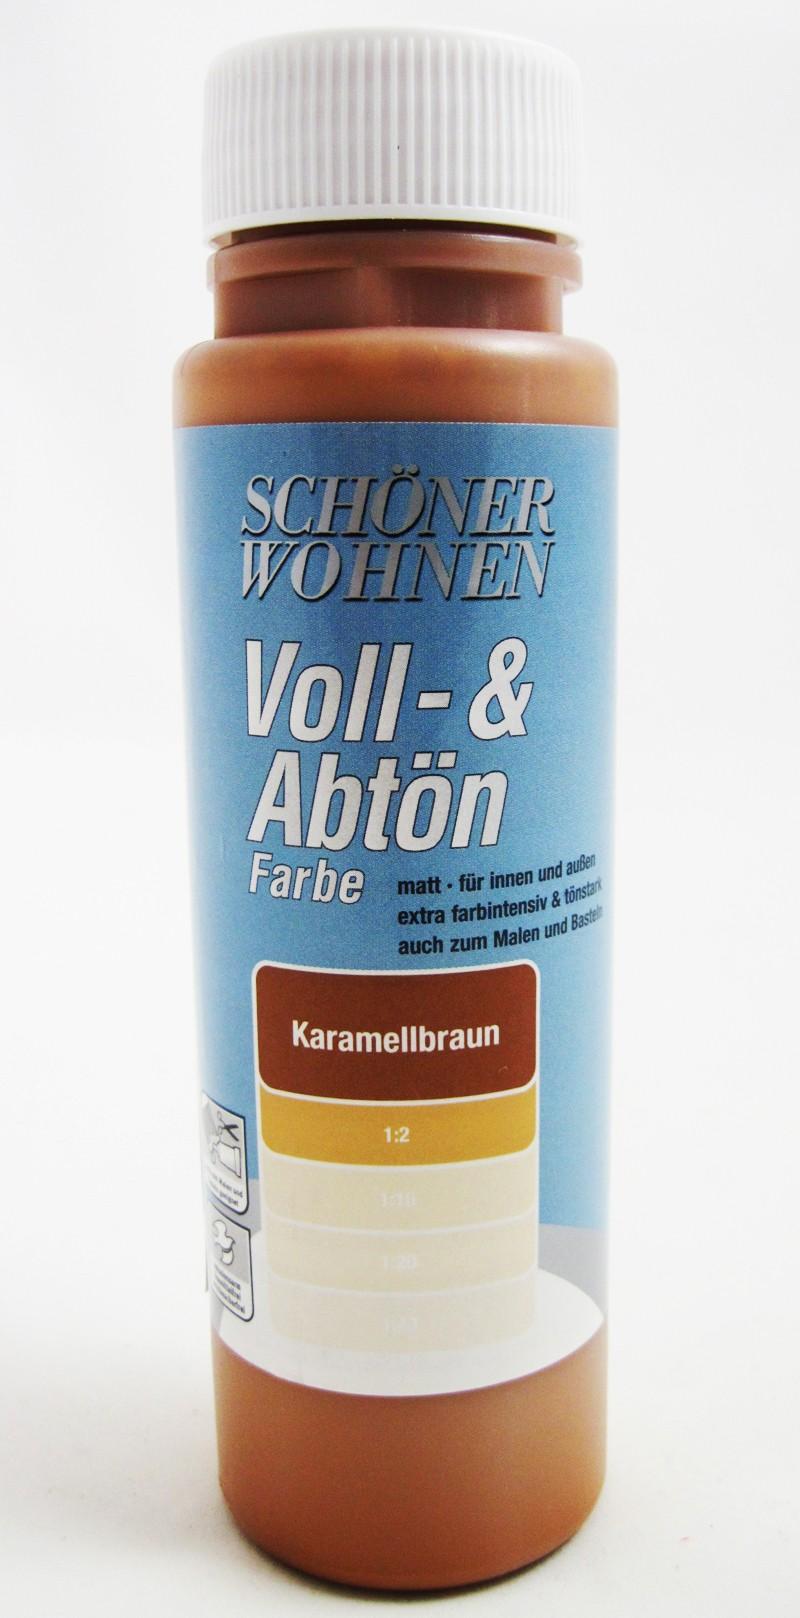 Voll- und Abtönfarbe Karamellbraun 500 ml